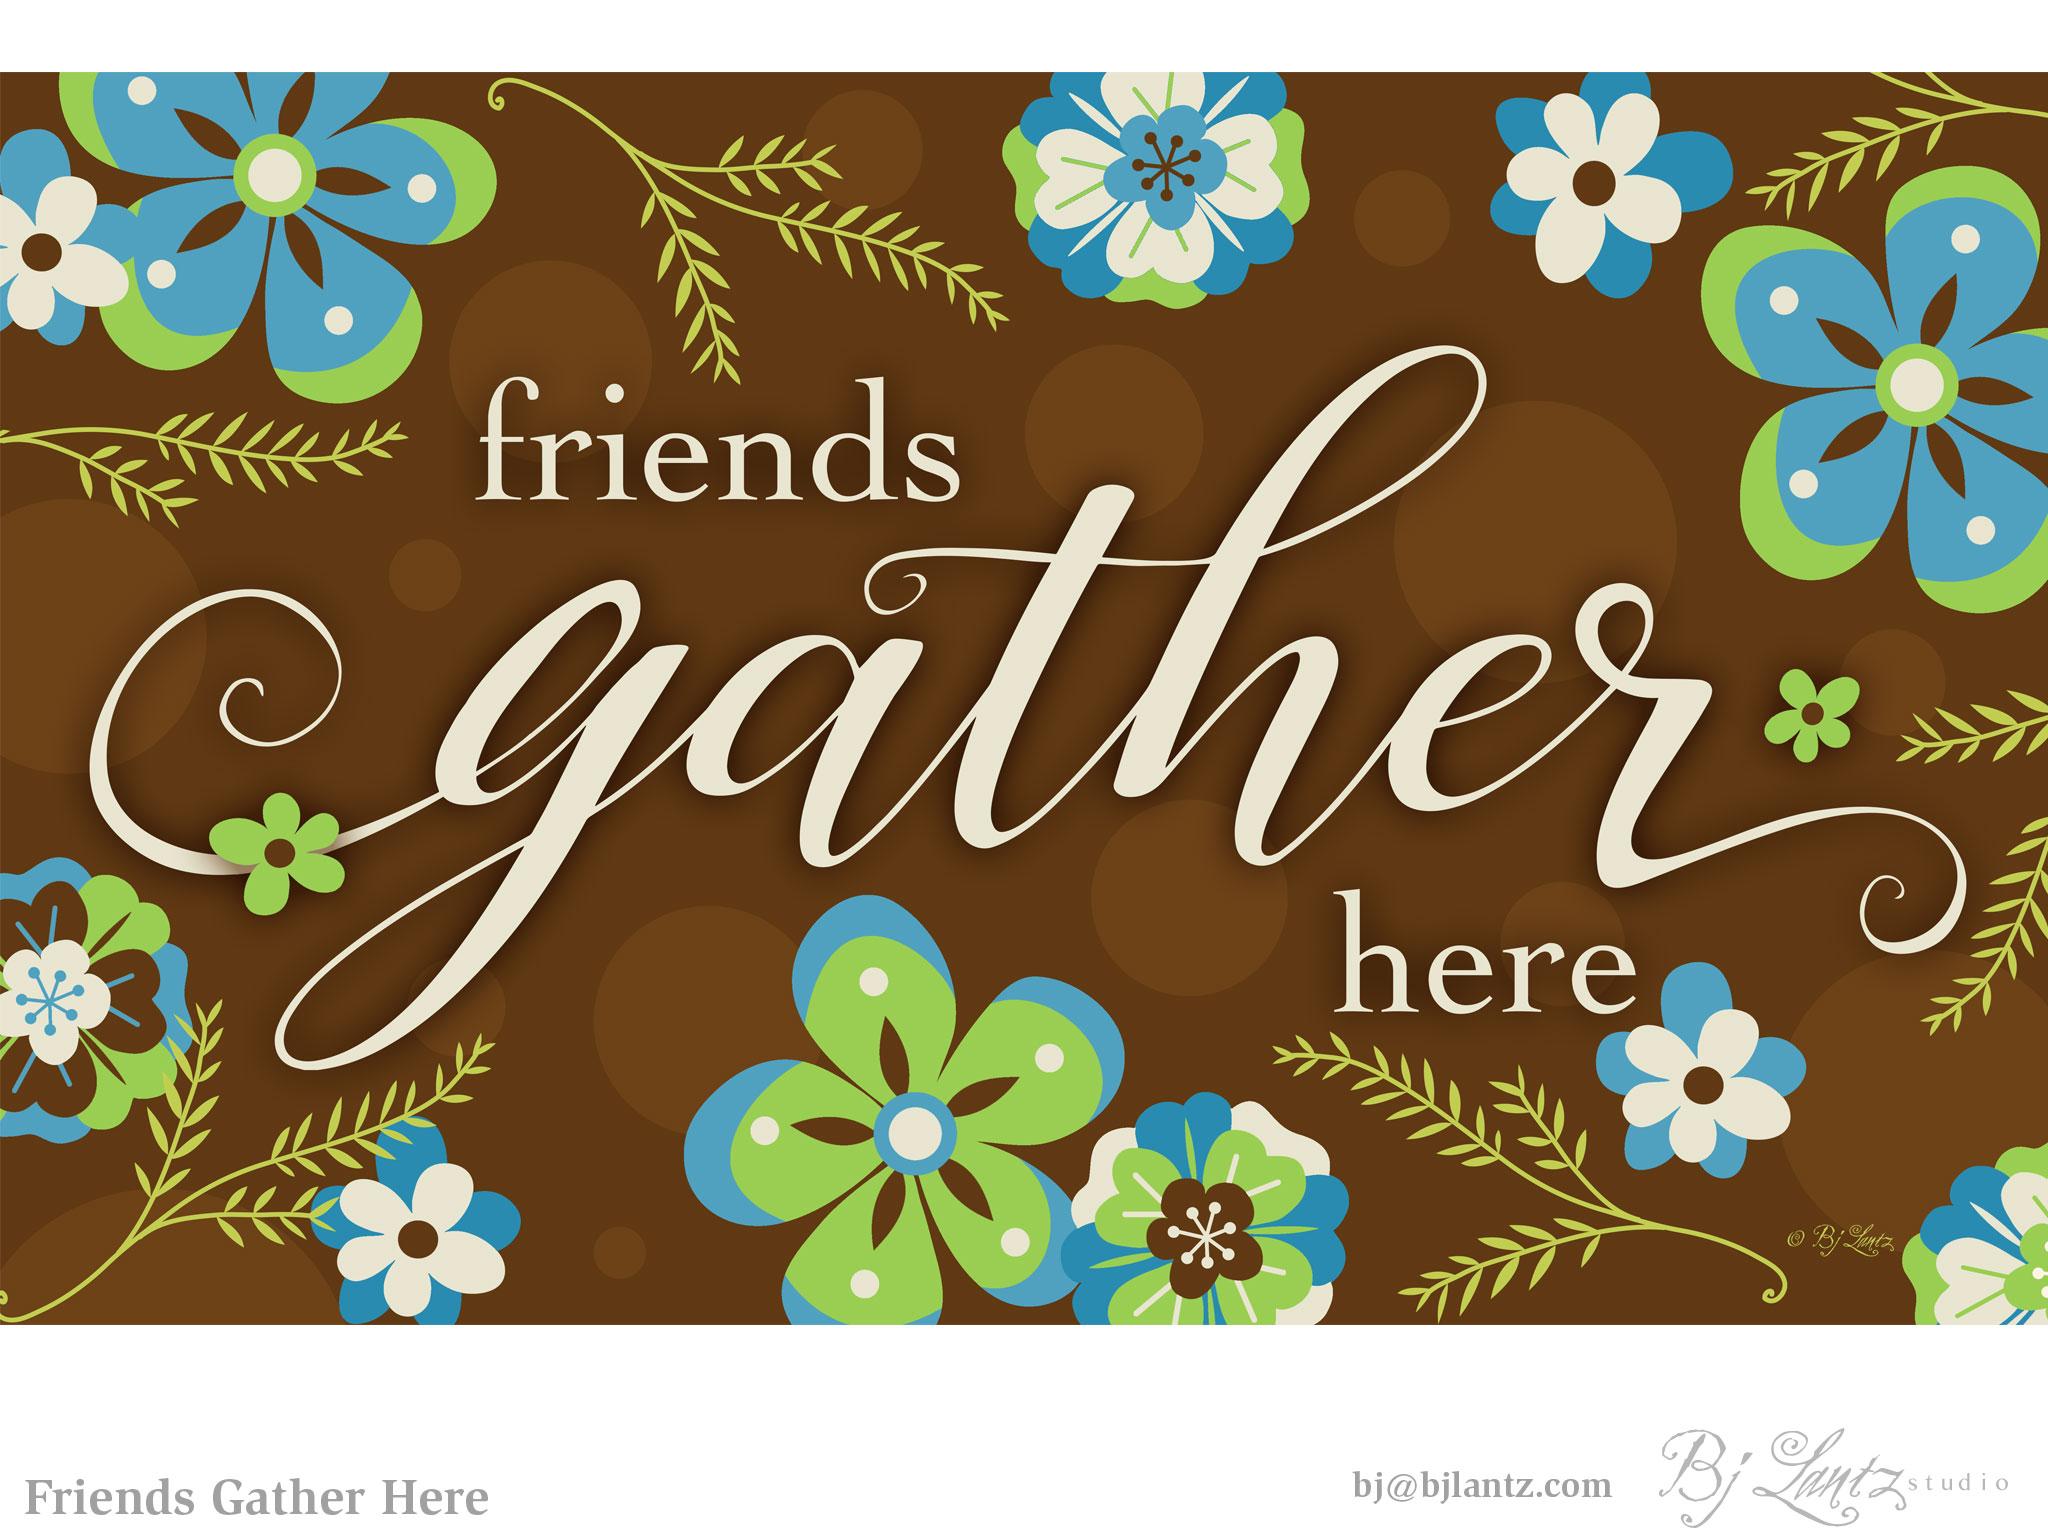 FriendsGatherHere_BJLantz_1.jpg